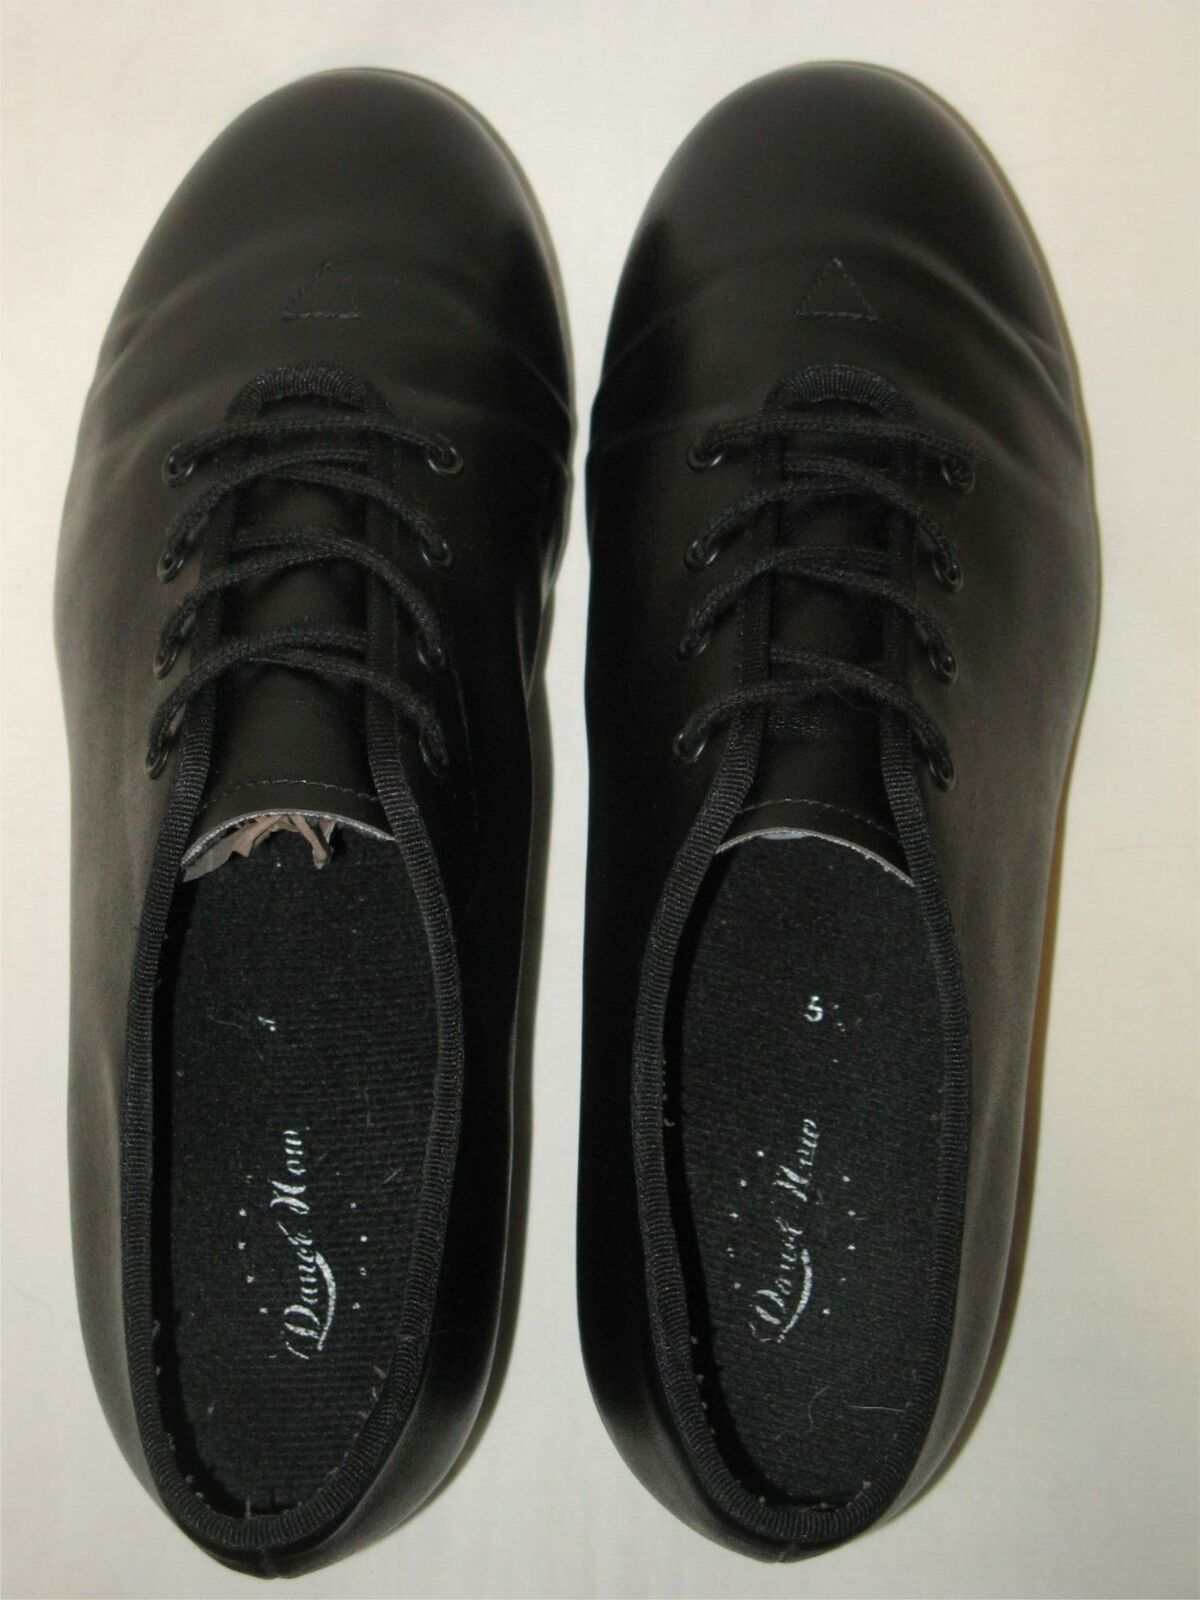 Tap Dance Shoes Oxfords Children's Sz 5.5 M Black With Bloch Metal Hardware